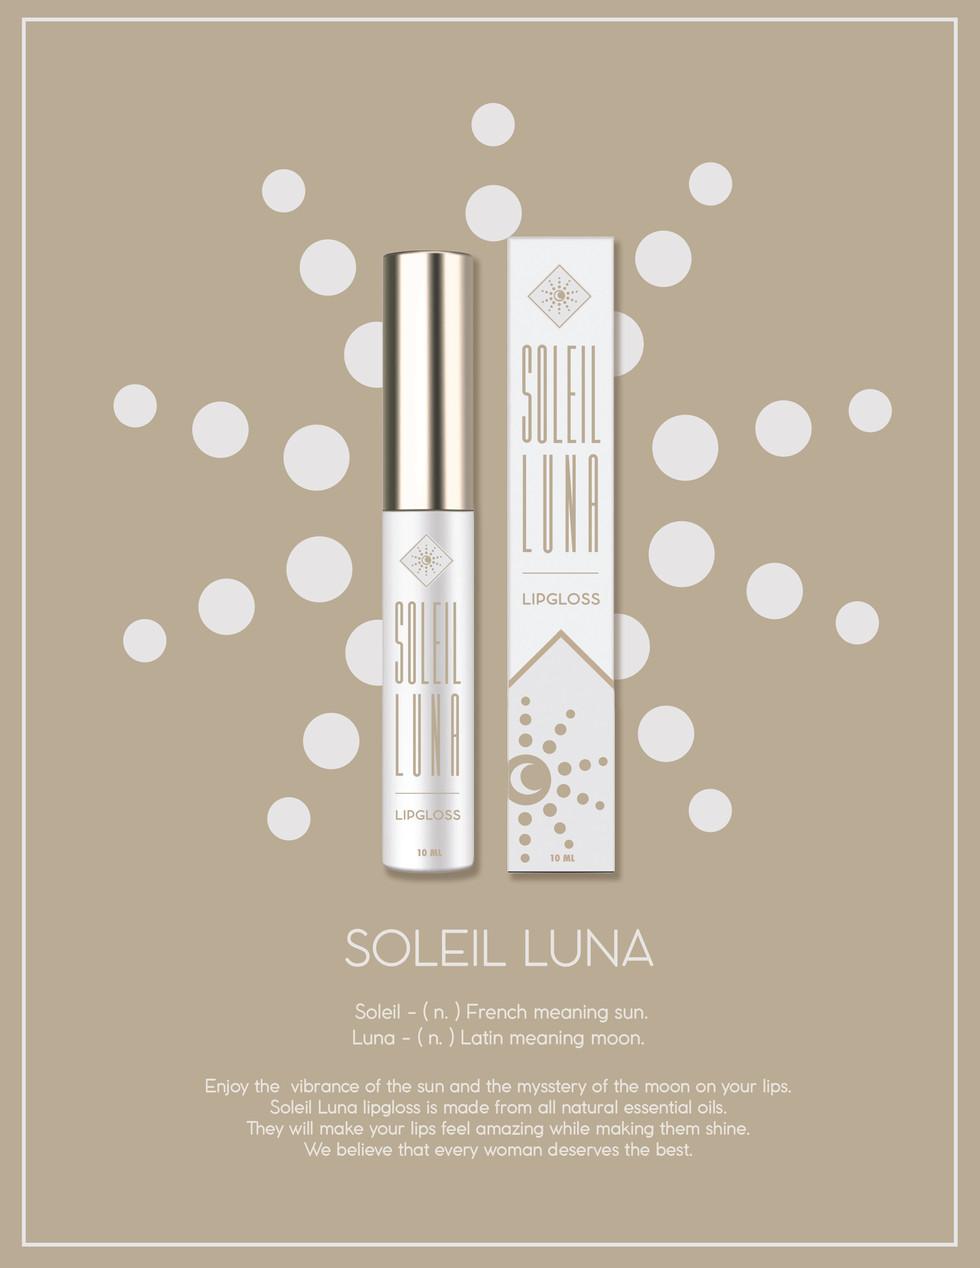 SOLEIL LUNA AD